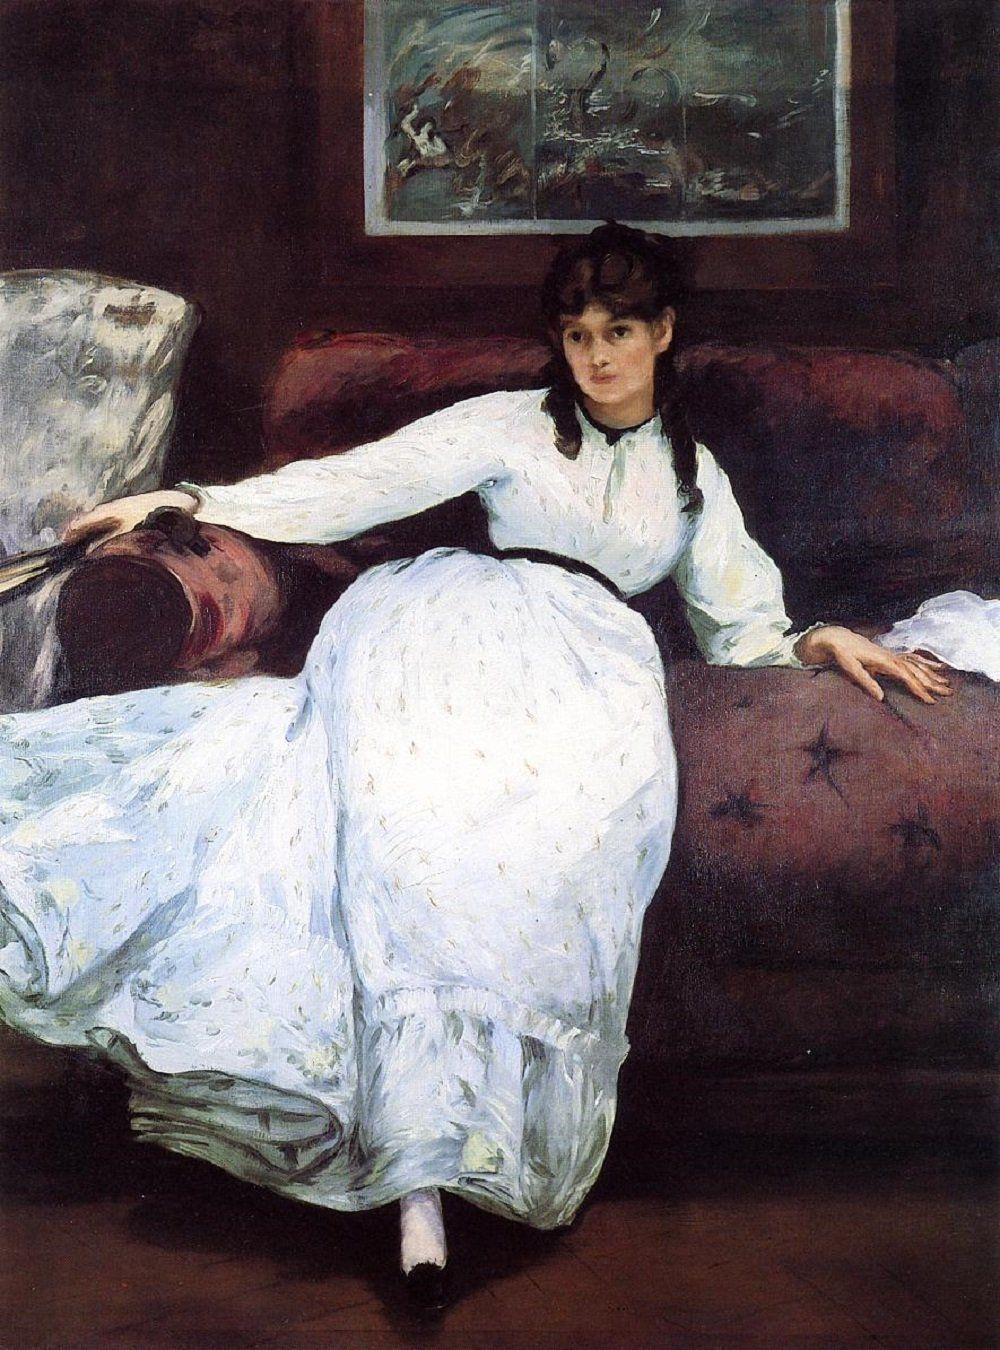 Edouard Manet. Rest. Portrait of Berthe Morisot